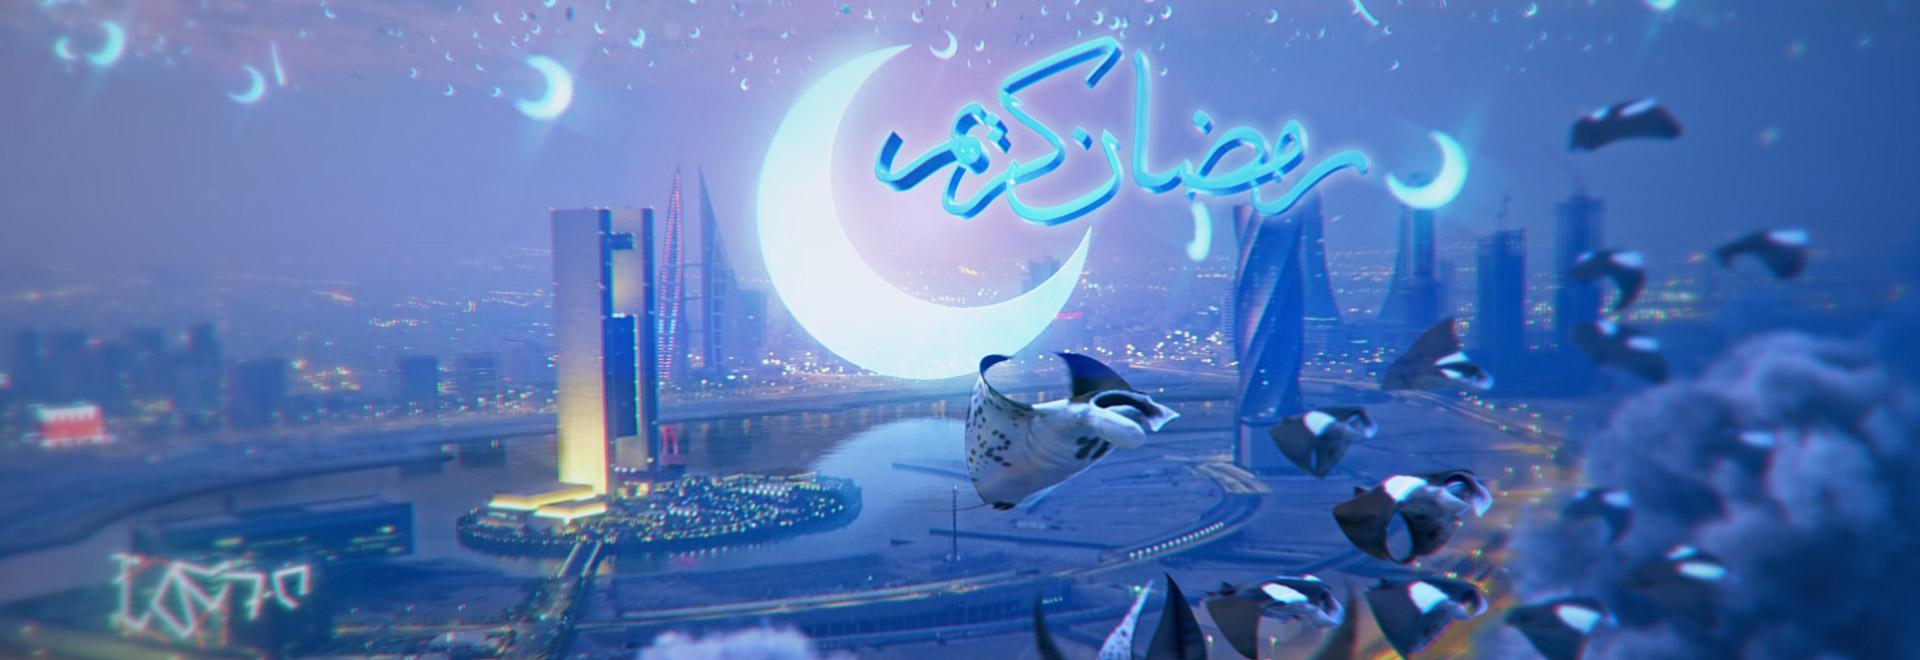 banner-ramadan-2016